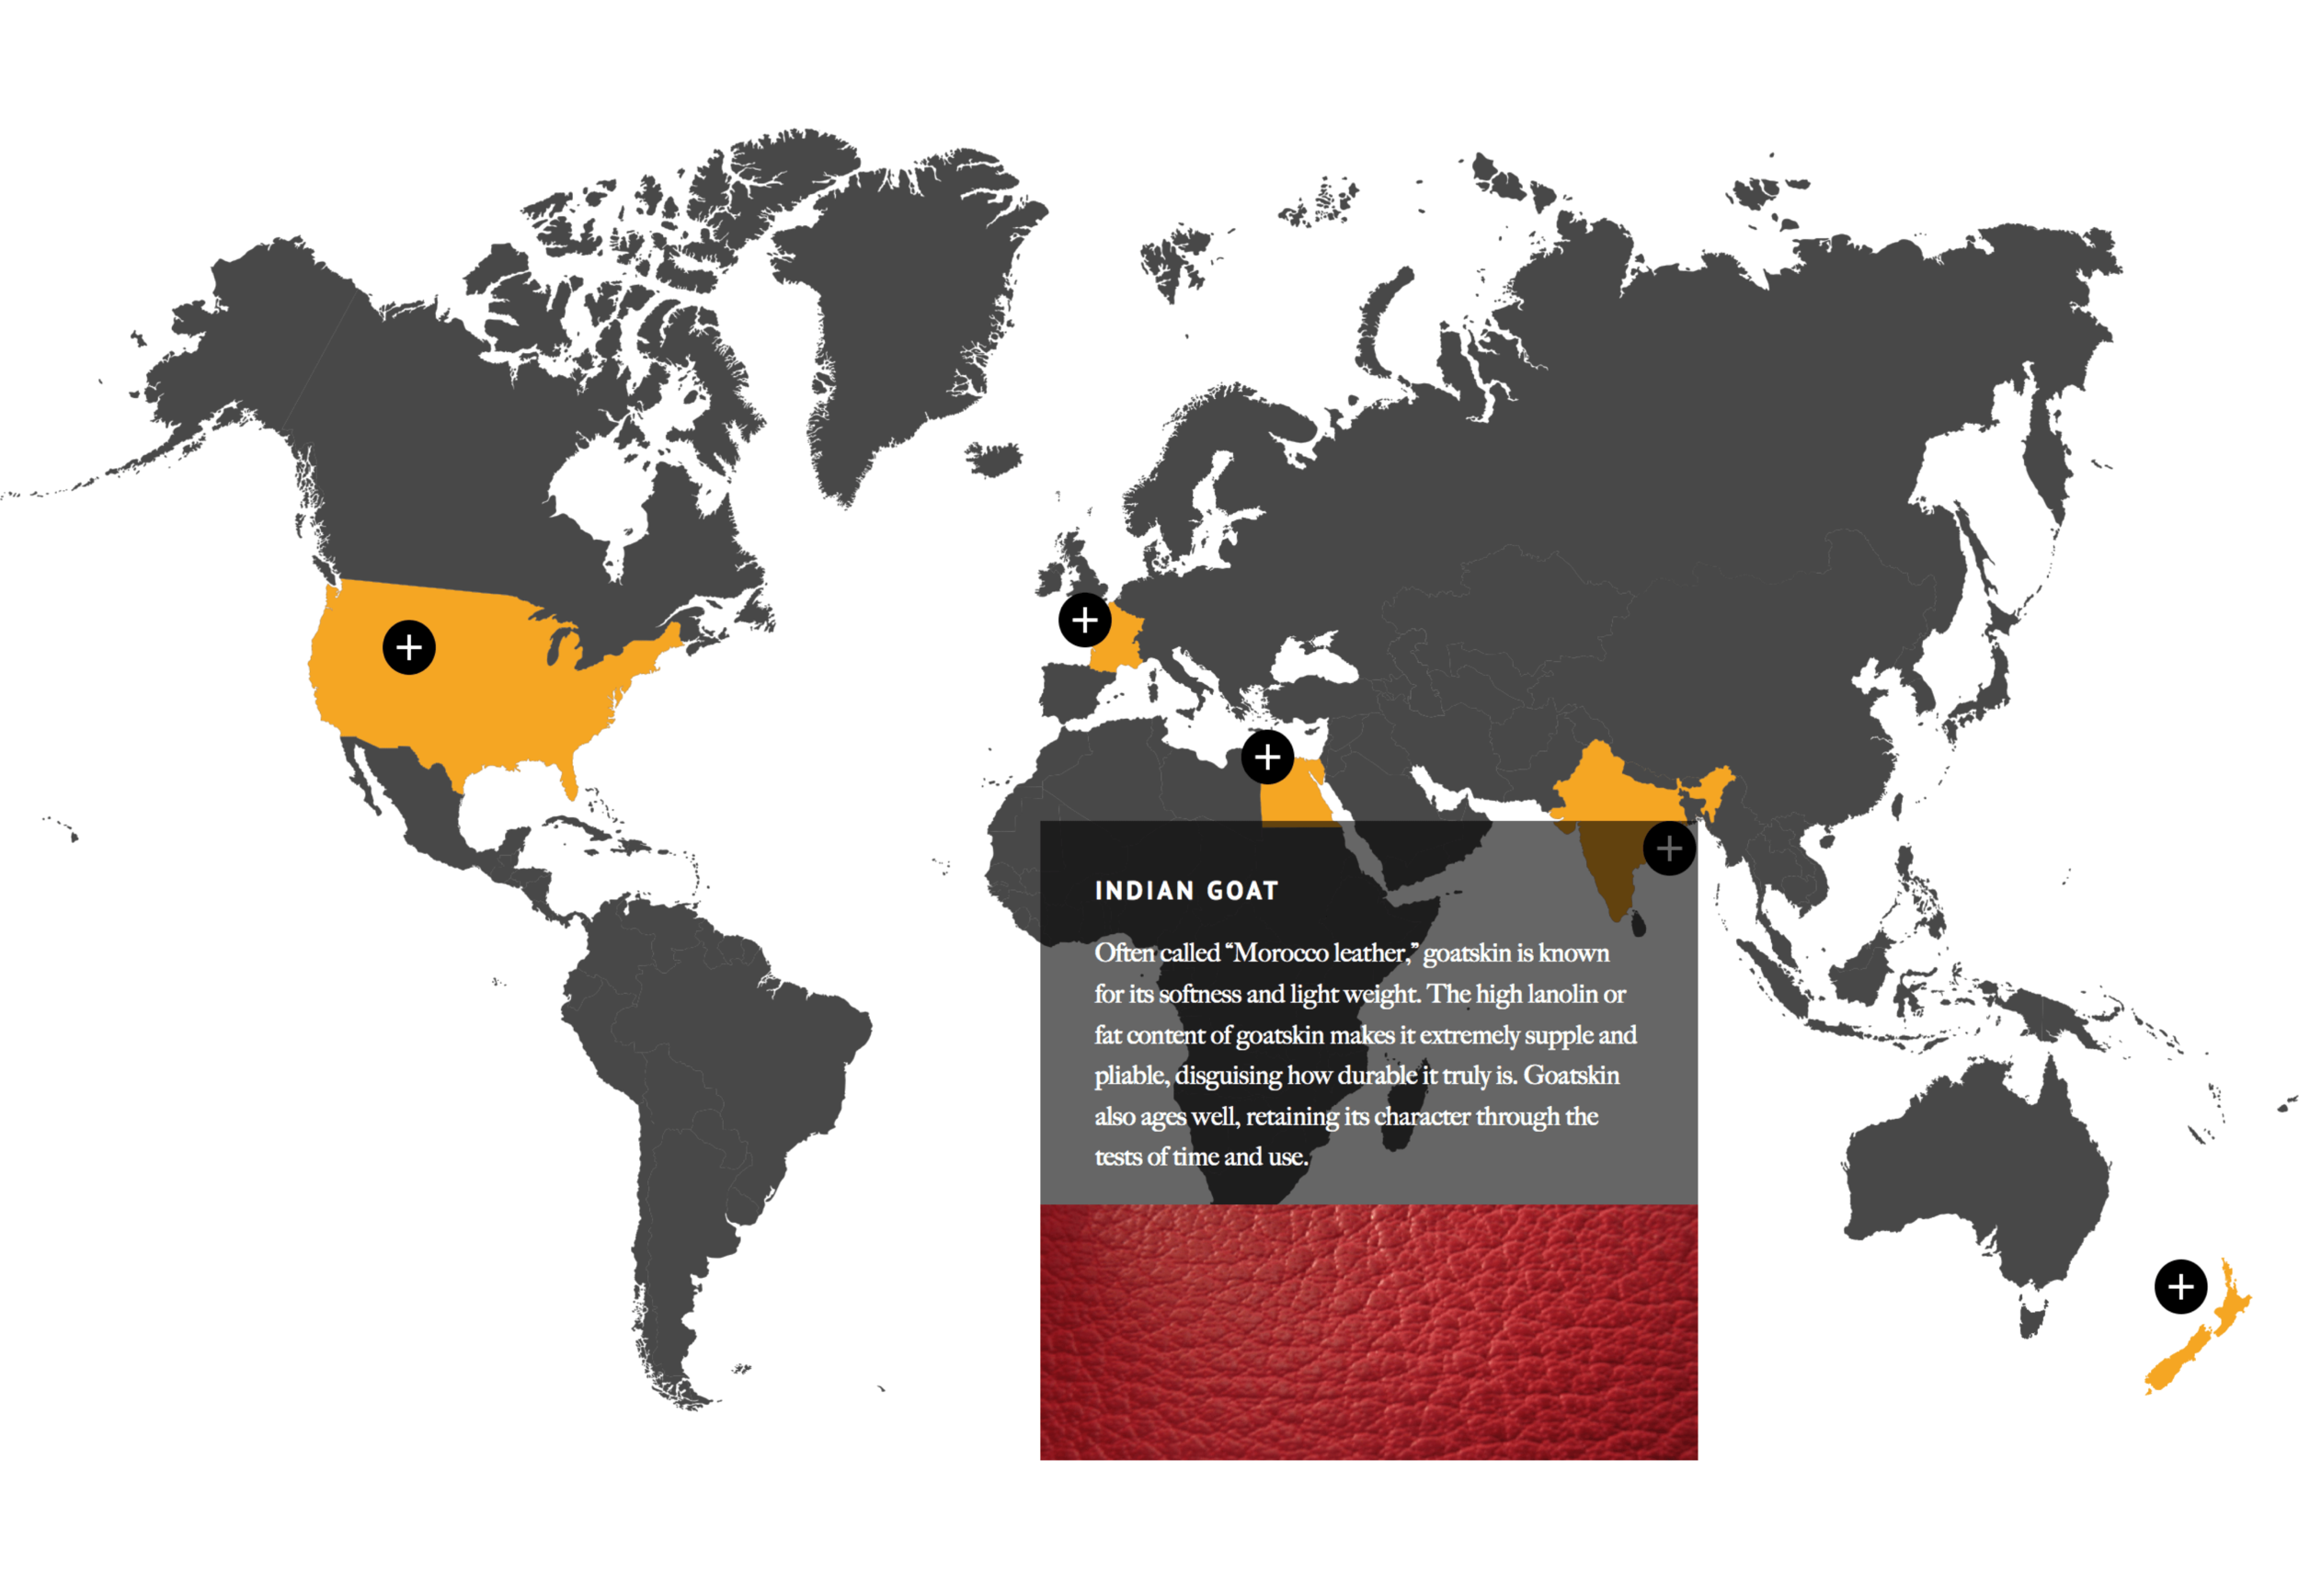 bluprint-case-studies-tusk-sourcing-map.png